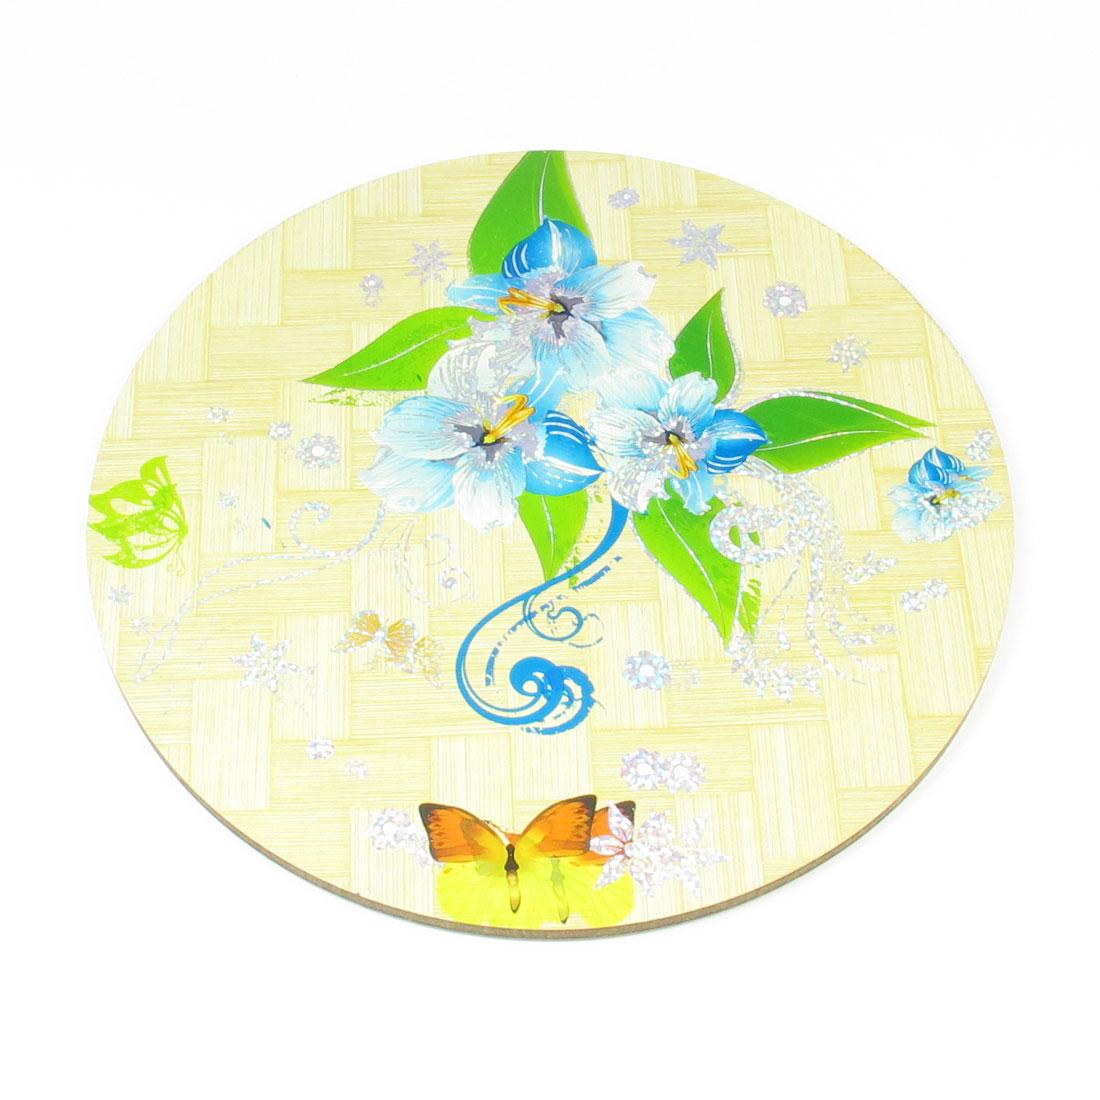 Home Tea House Round Design Beige Blue Green Flower Print Wood Cup Pot Mat Coaster Pad